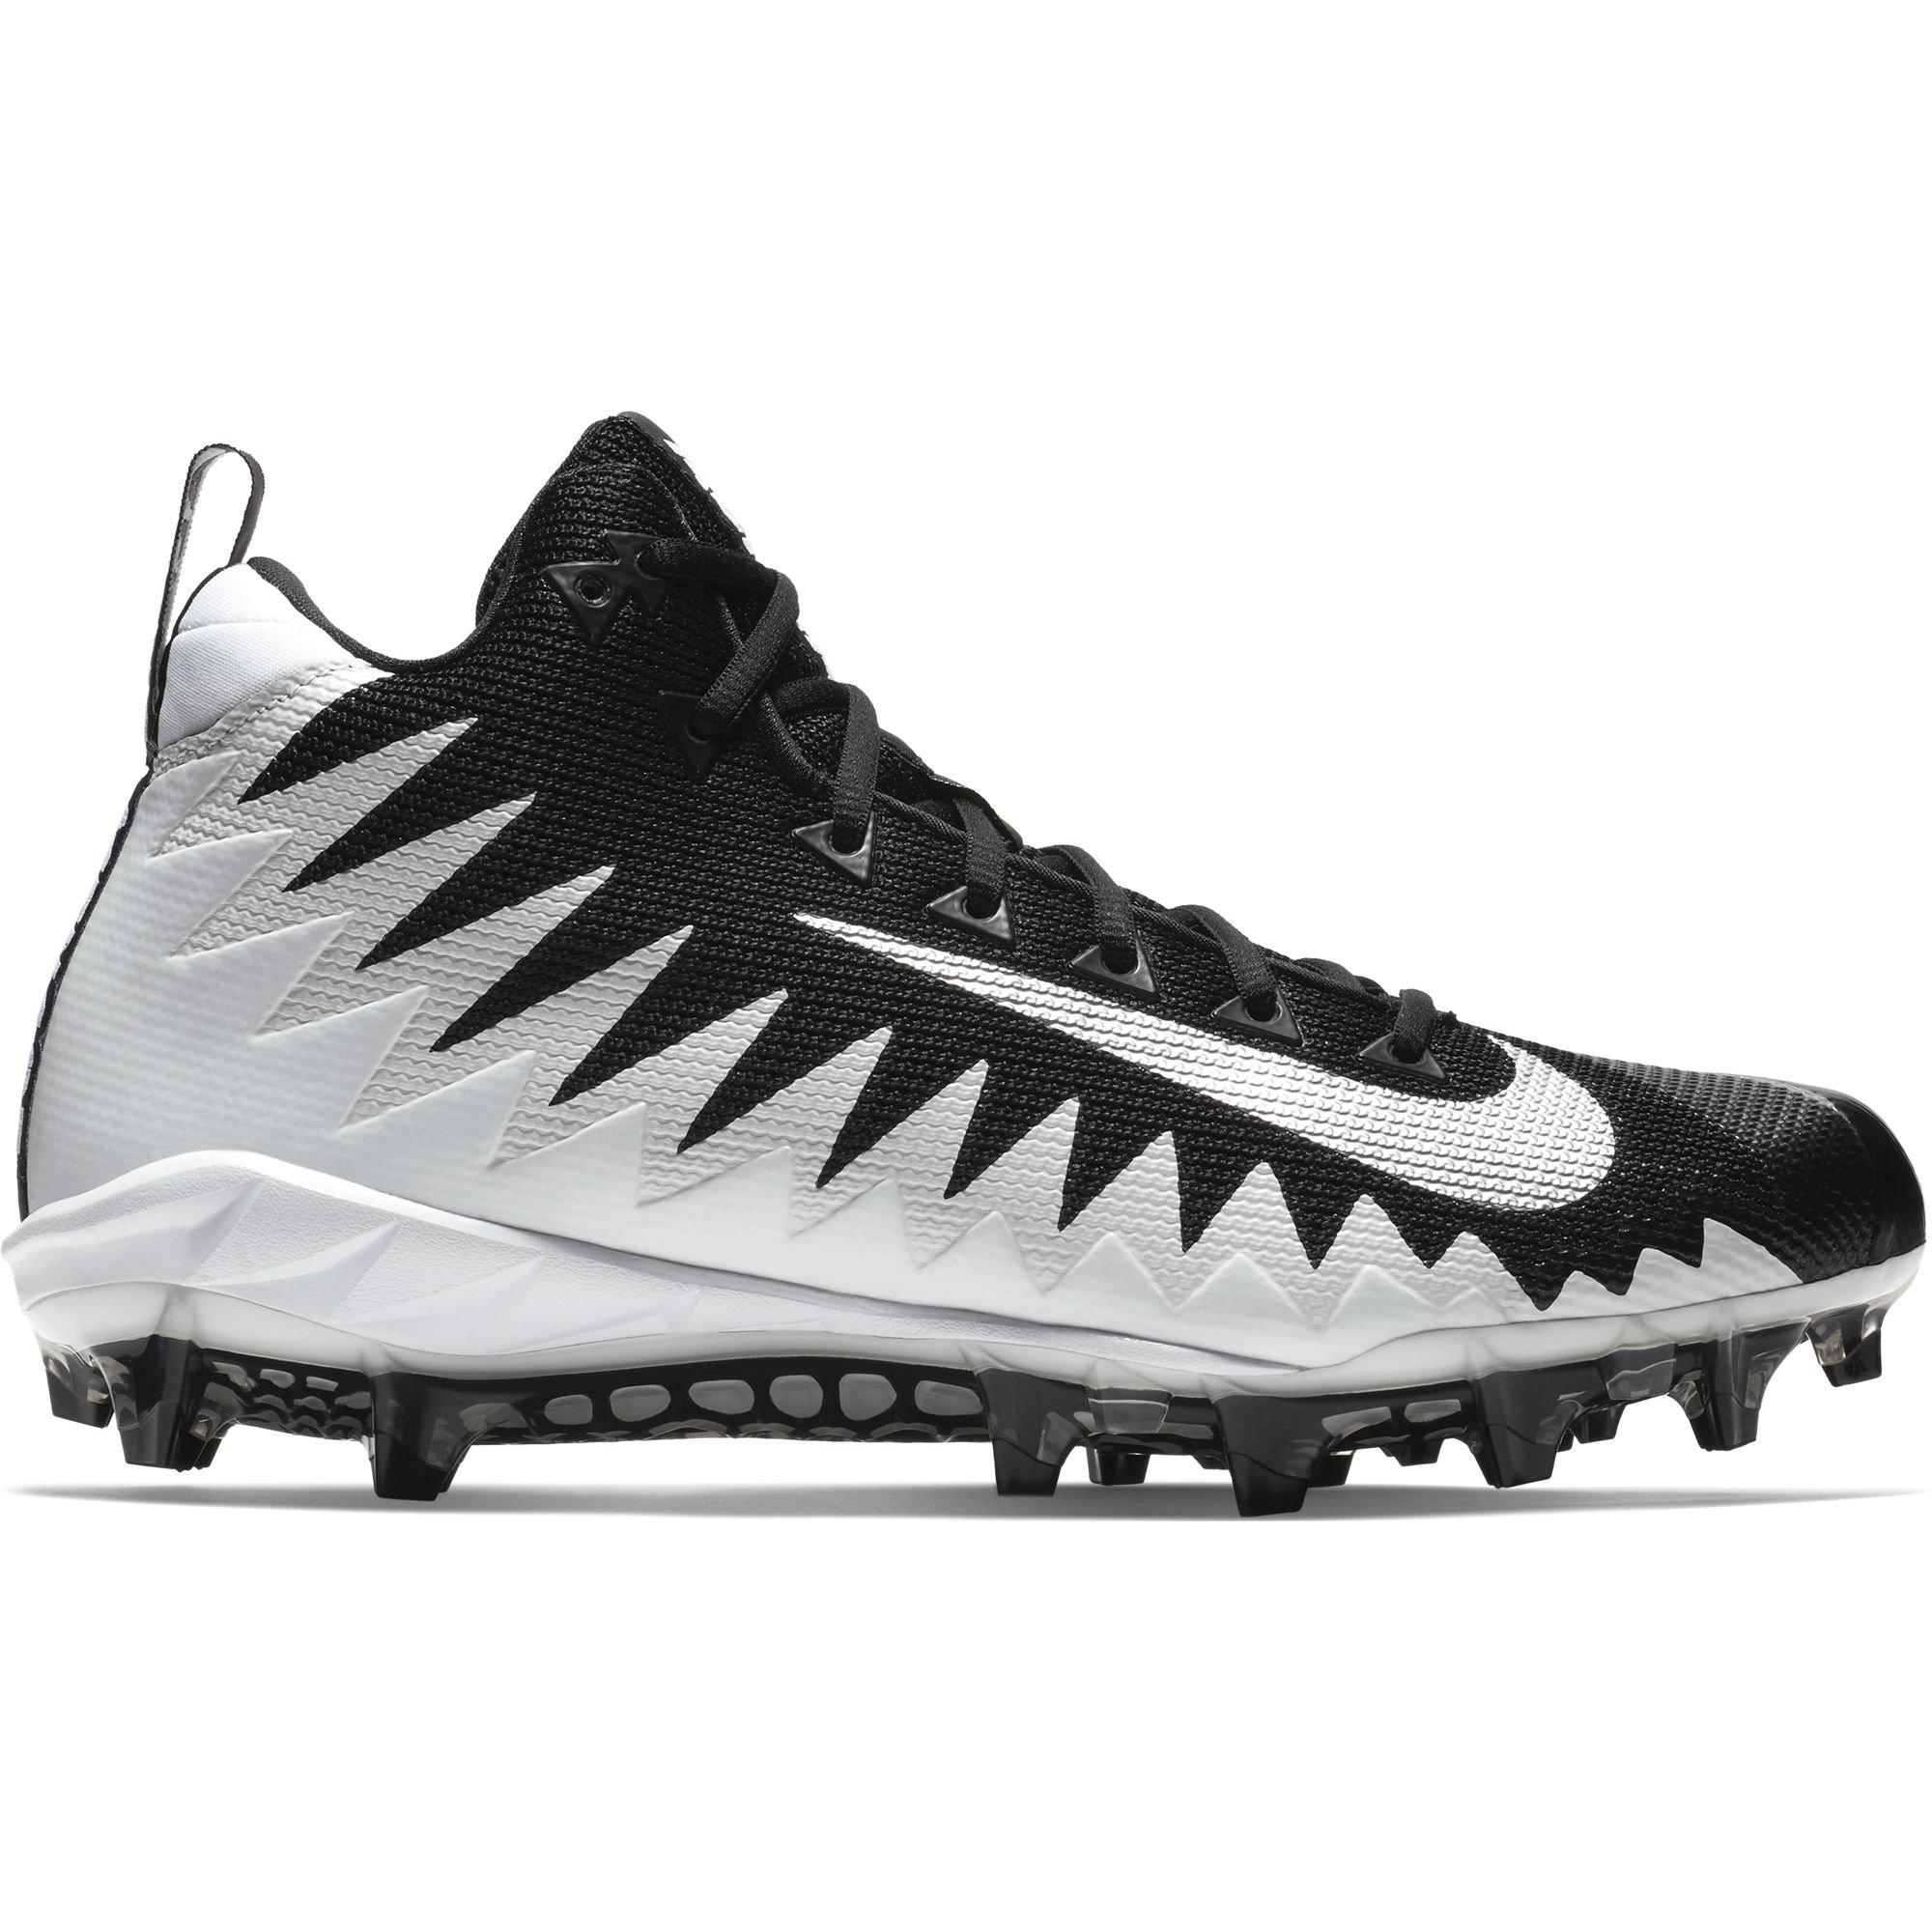 sale retailer a9800 b3492 Galleon - Nike Mens Alpha Menace Pro Mid Football Cleat WhiteMetallic  SilverBlack Size 11 M US